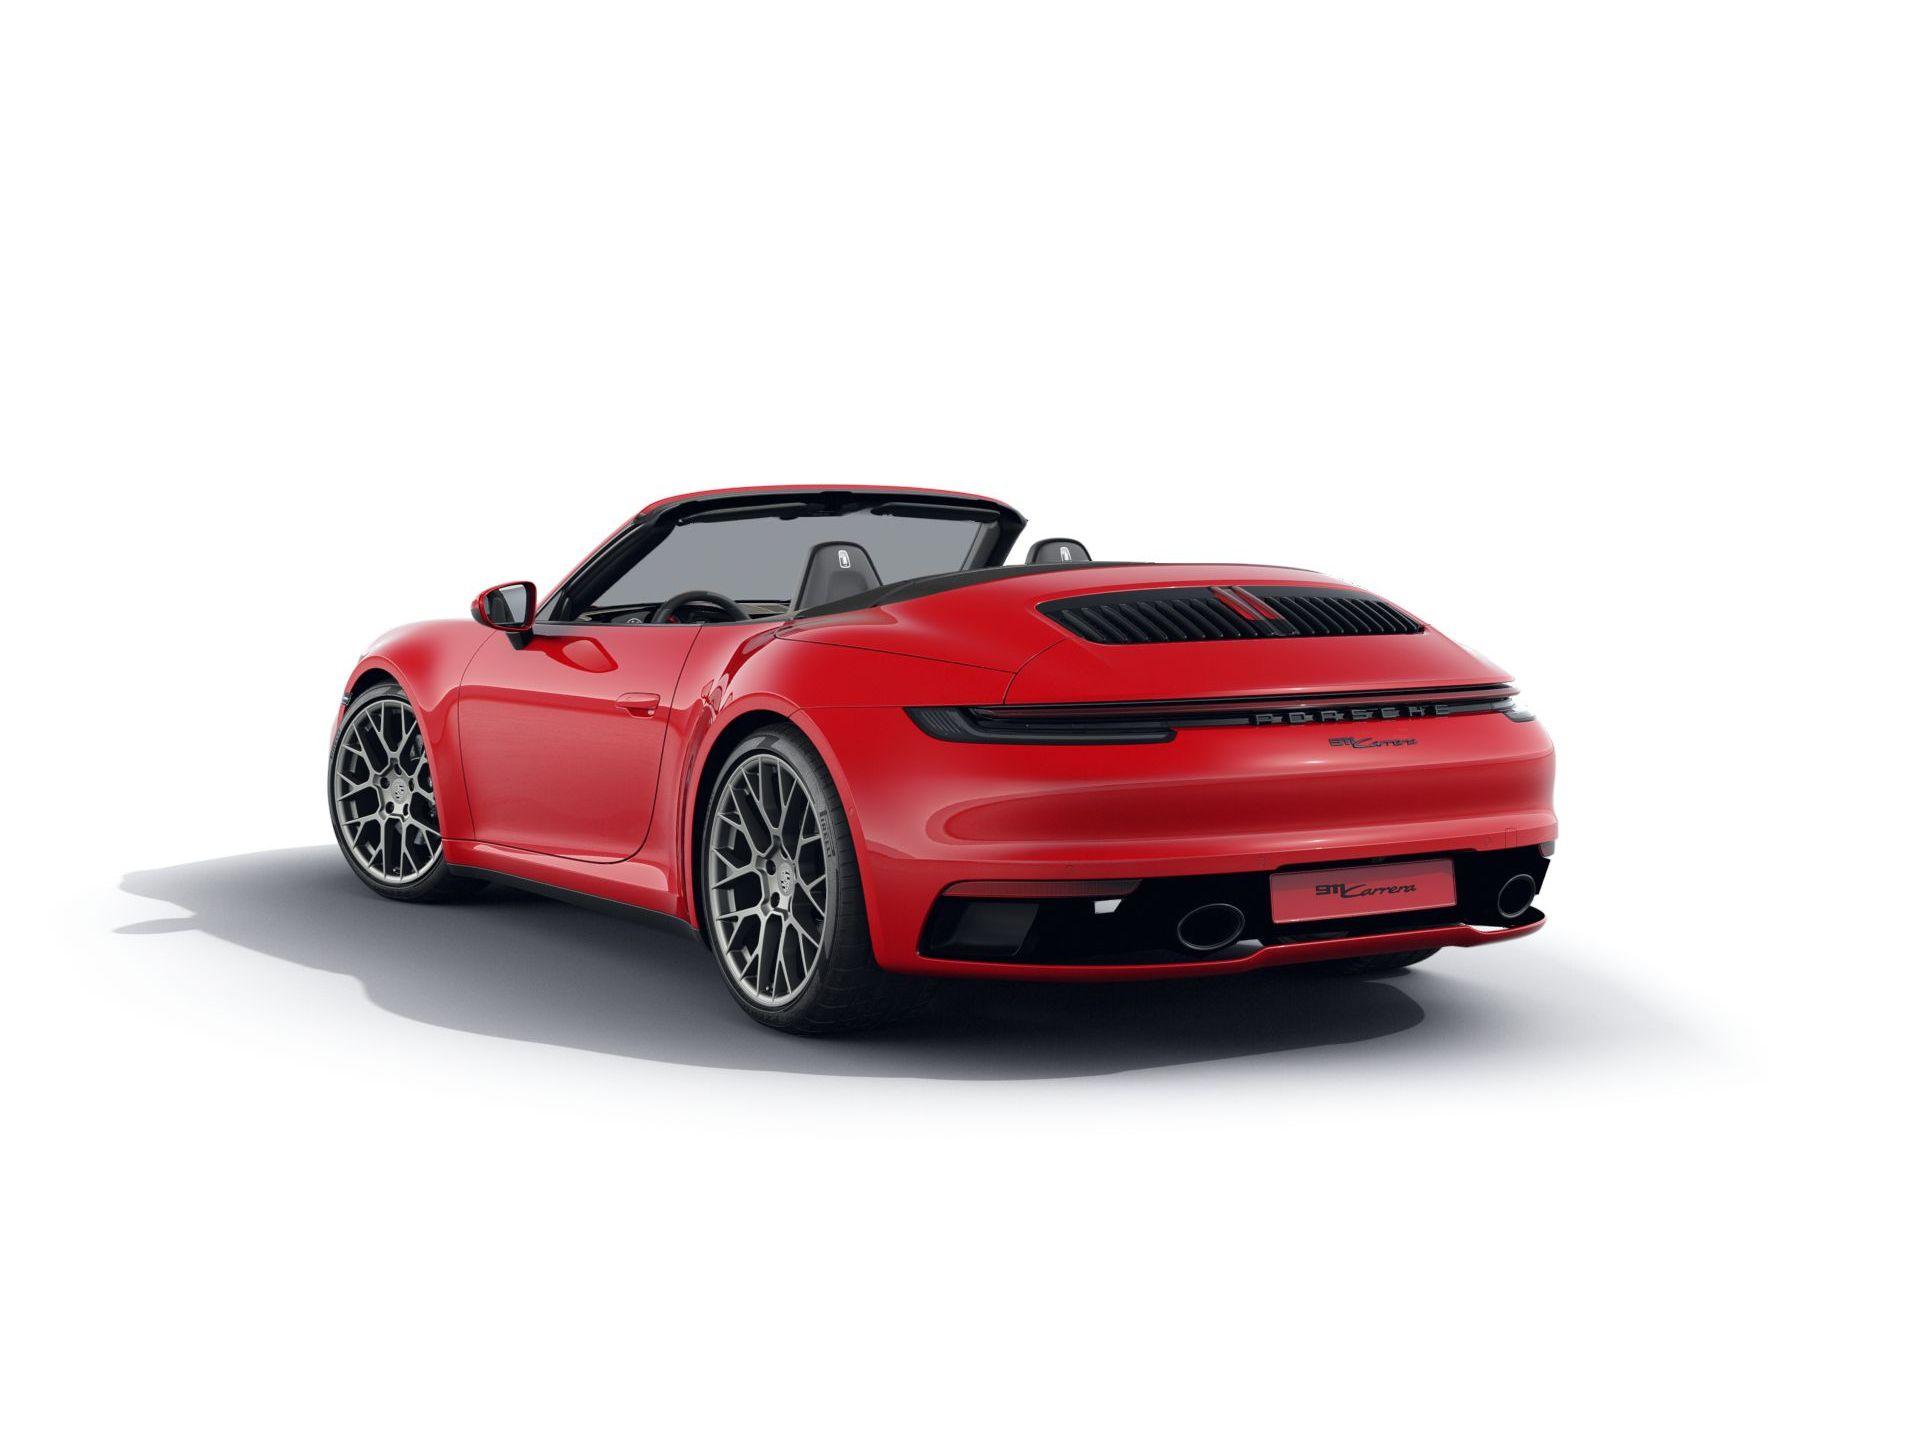 2022 Porsche 911 Carrera Cabriolet – 3